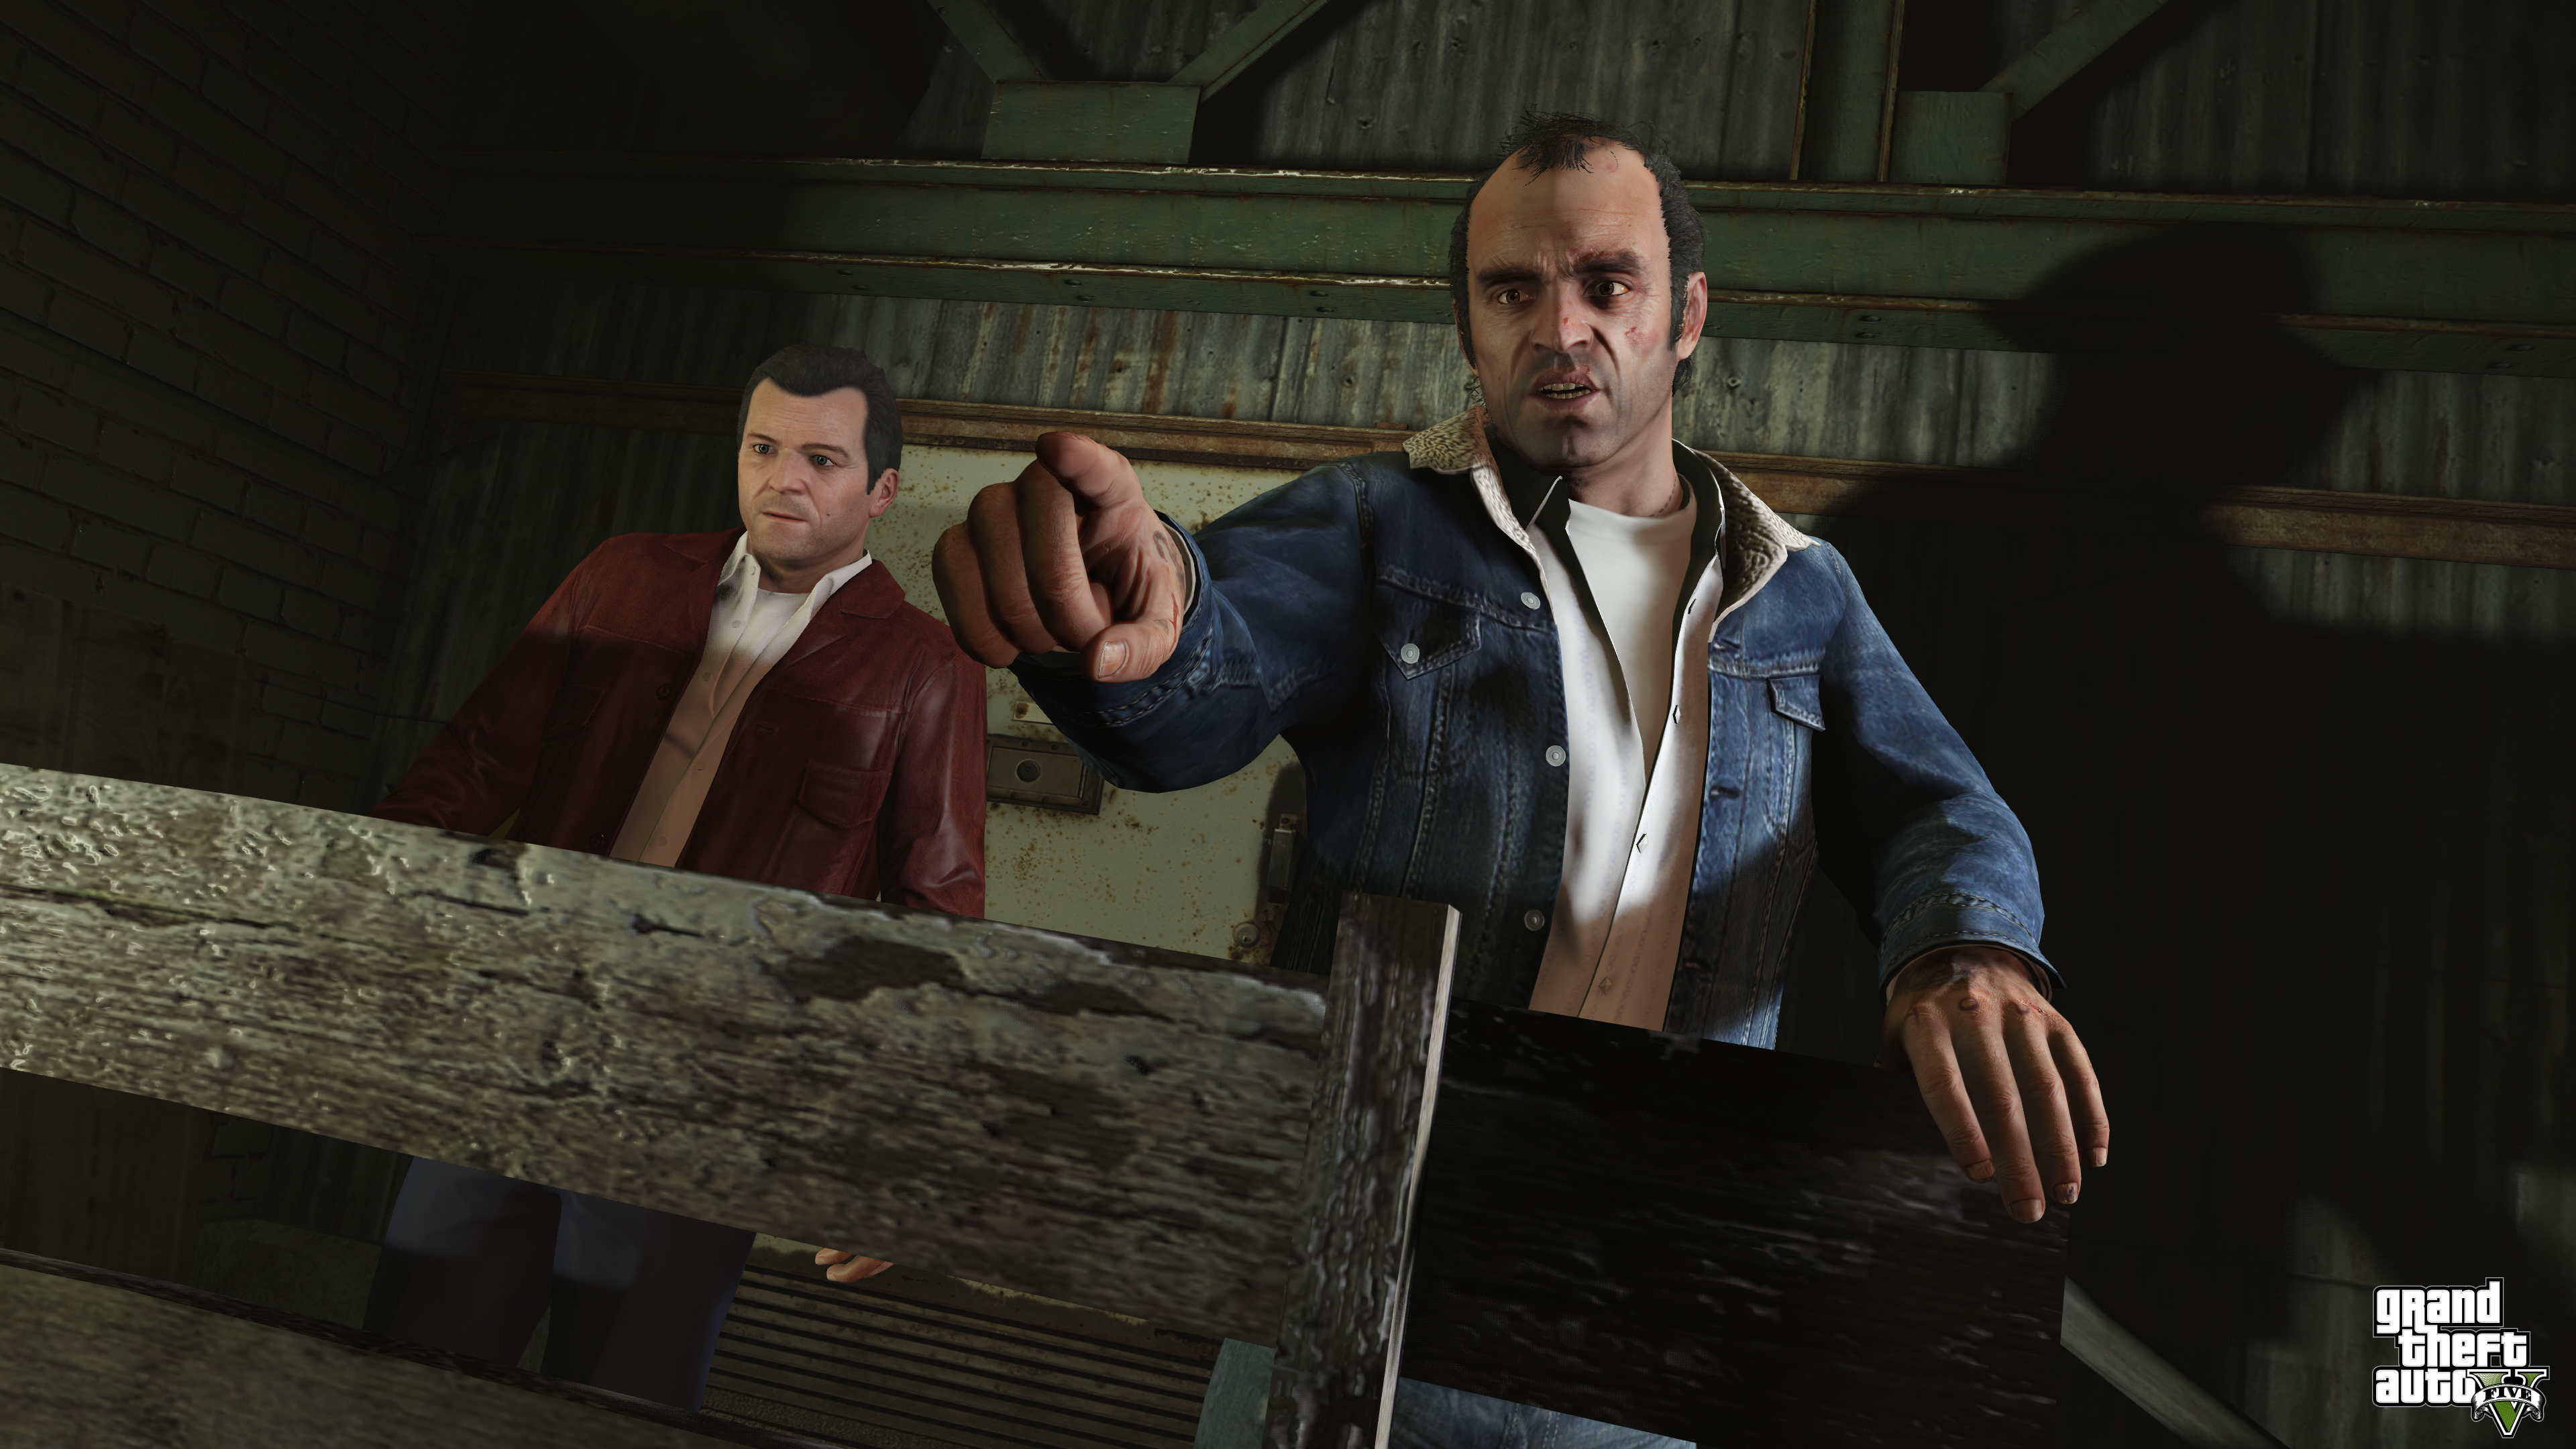 Блогер протестировал время загрузки GTA V на Xbox Series X — быстрее, чем на PS4 и Xbox One